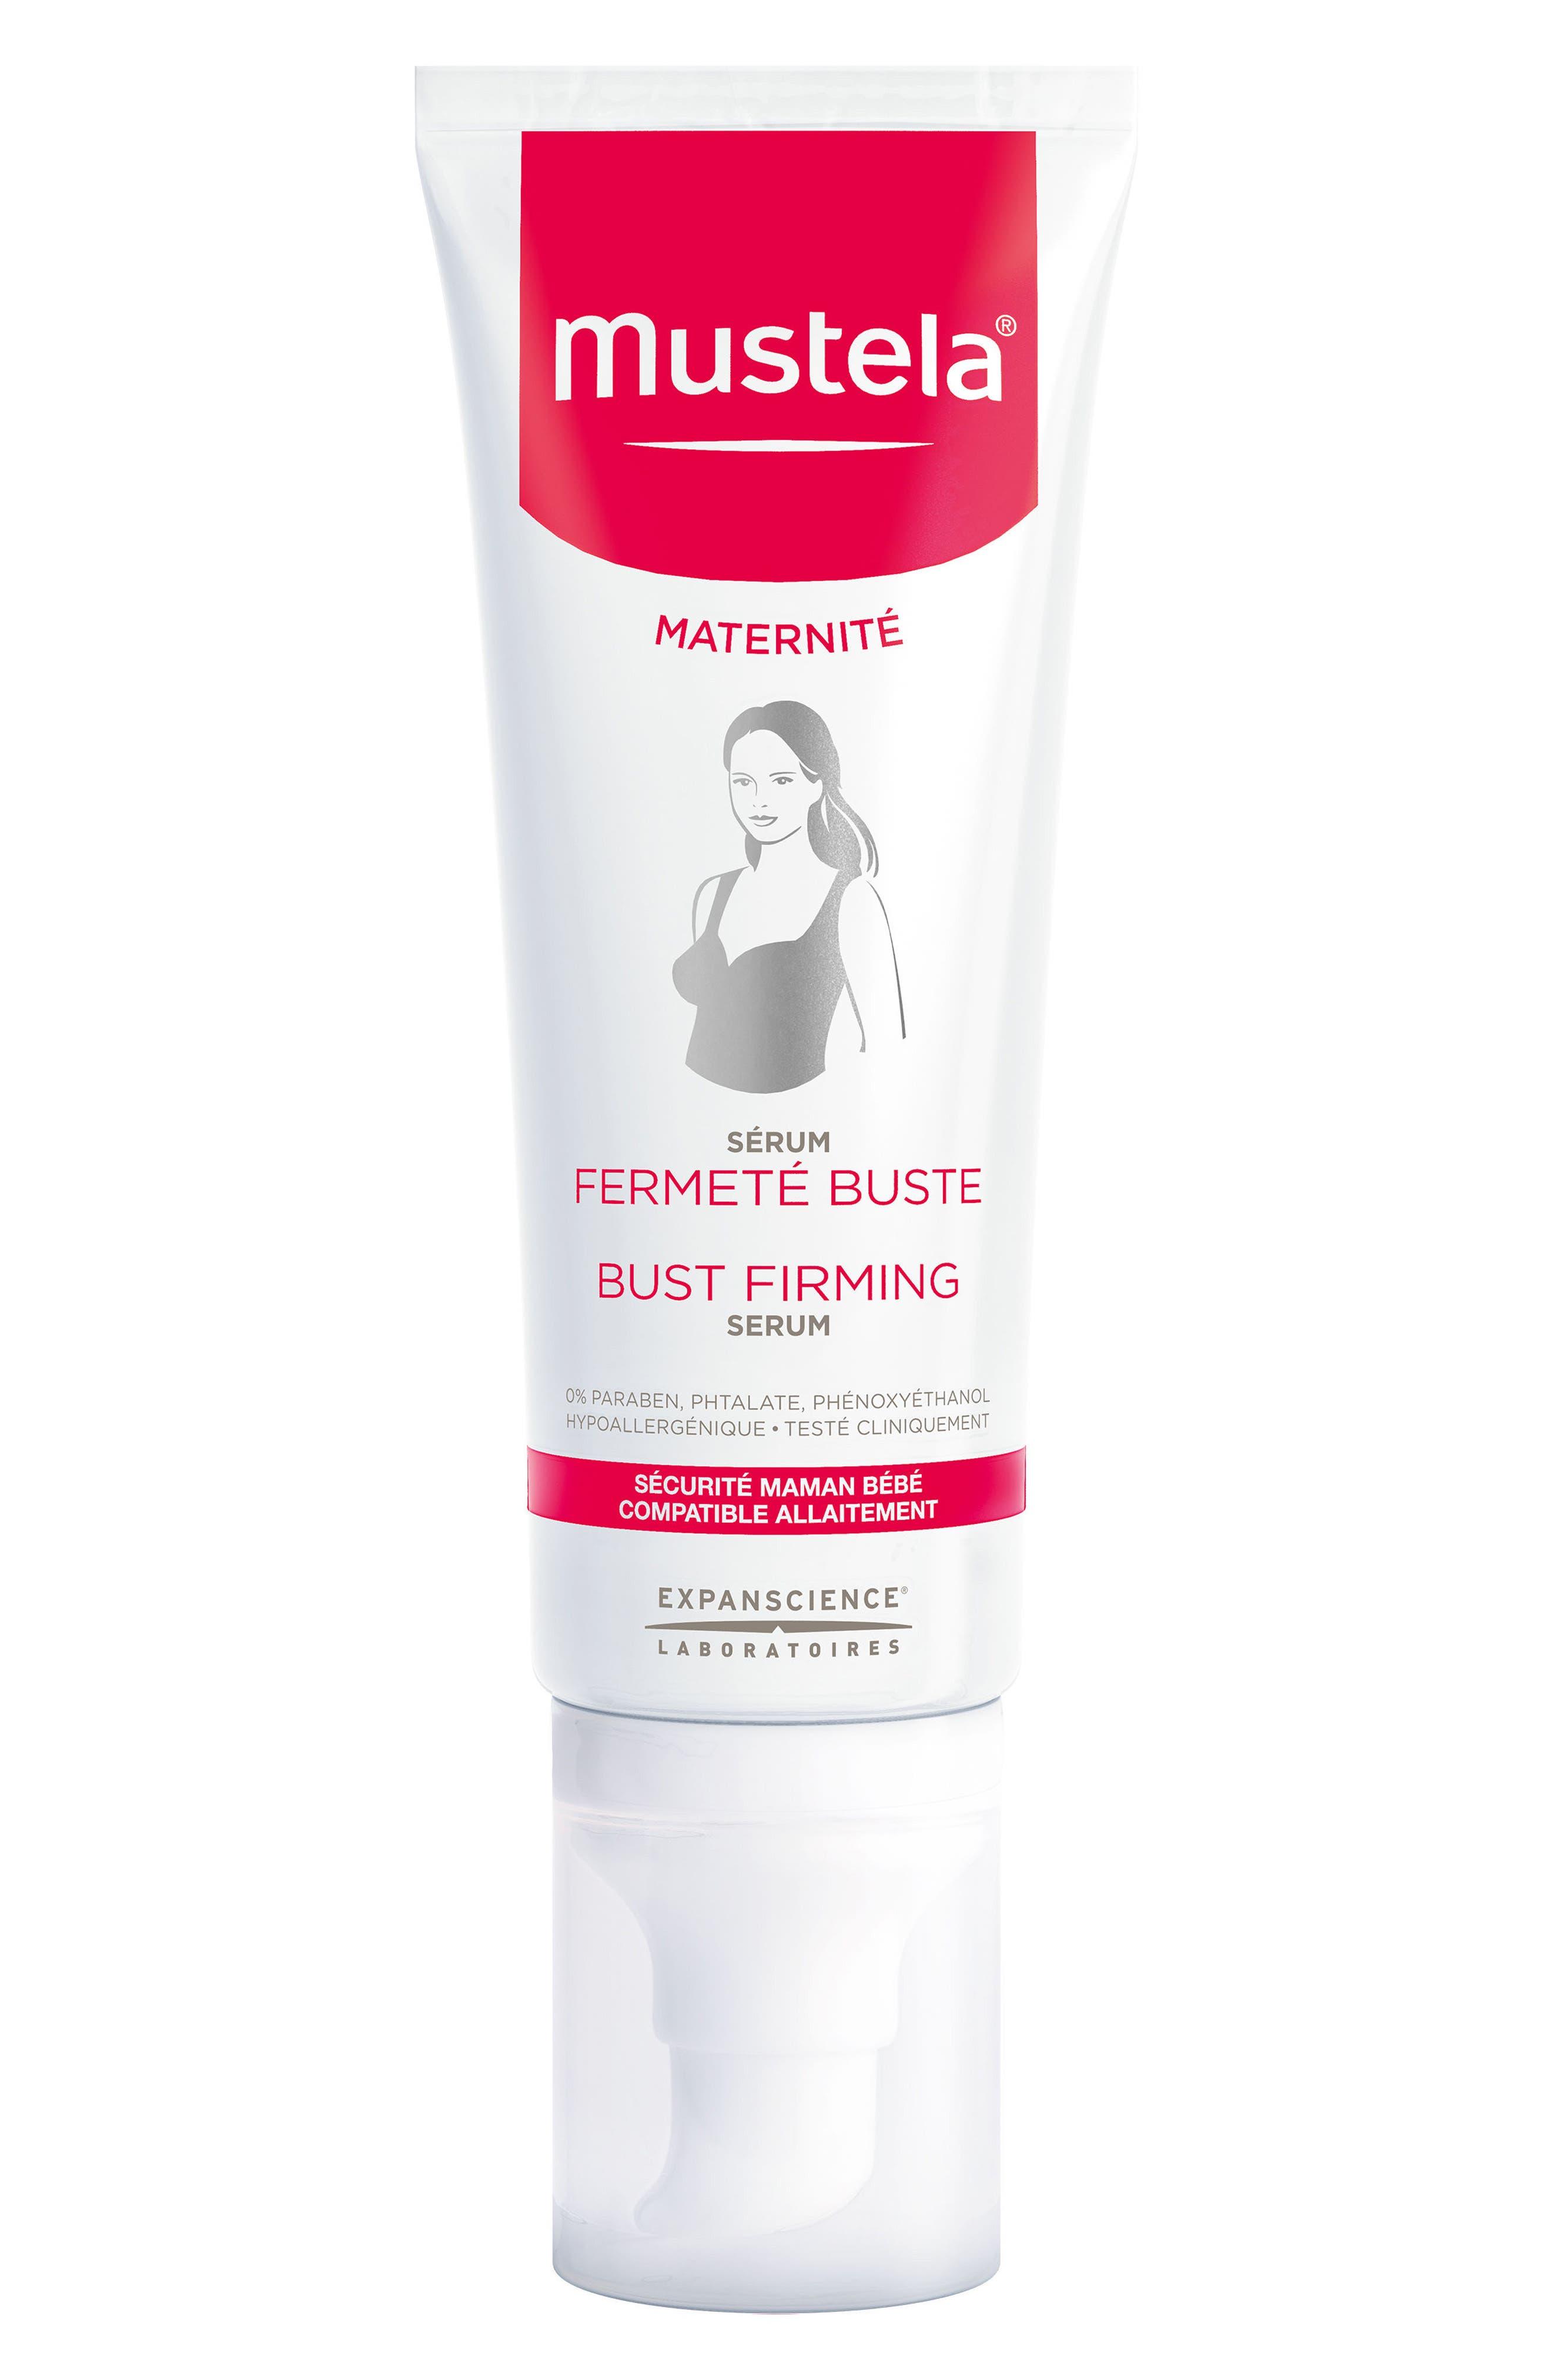 Mustela® Bust Firming Serum